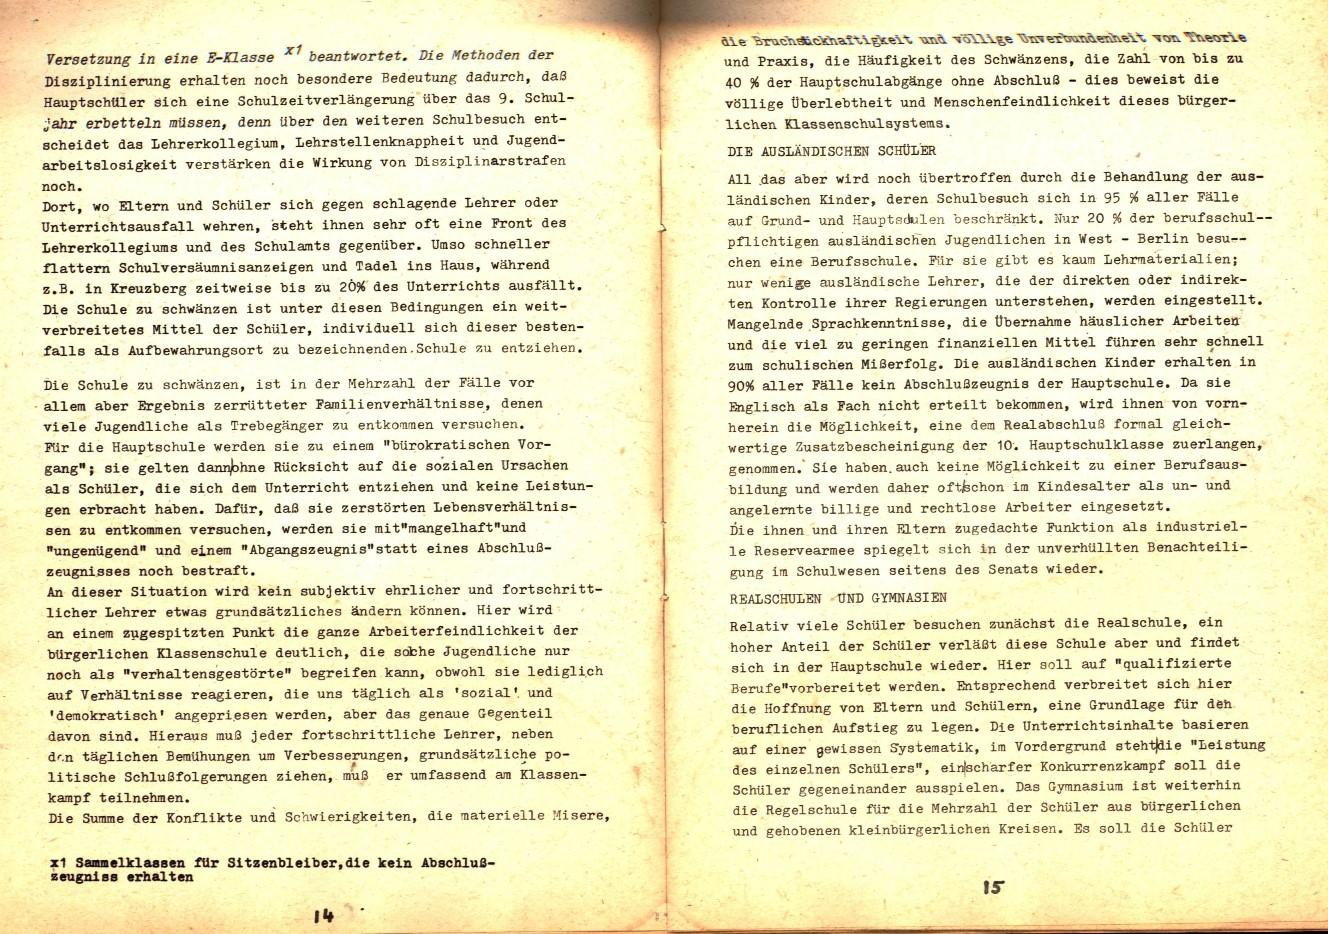 Berlin_BSLE_1975_Grundlagenpapier_09